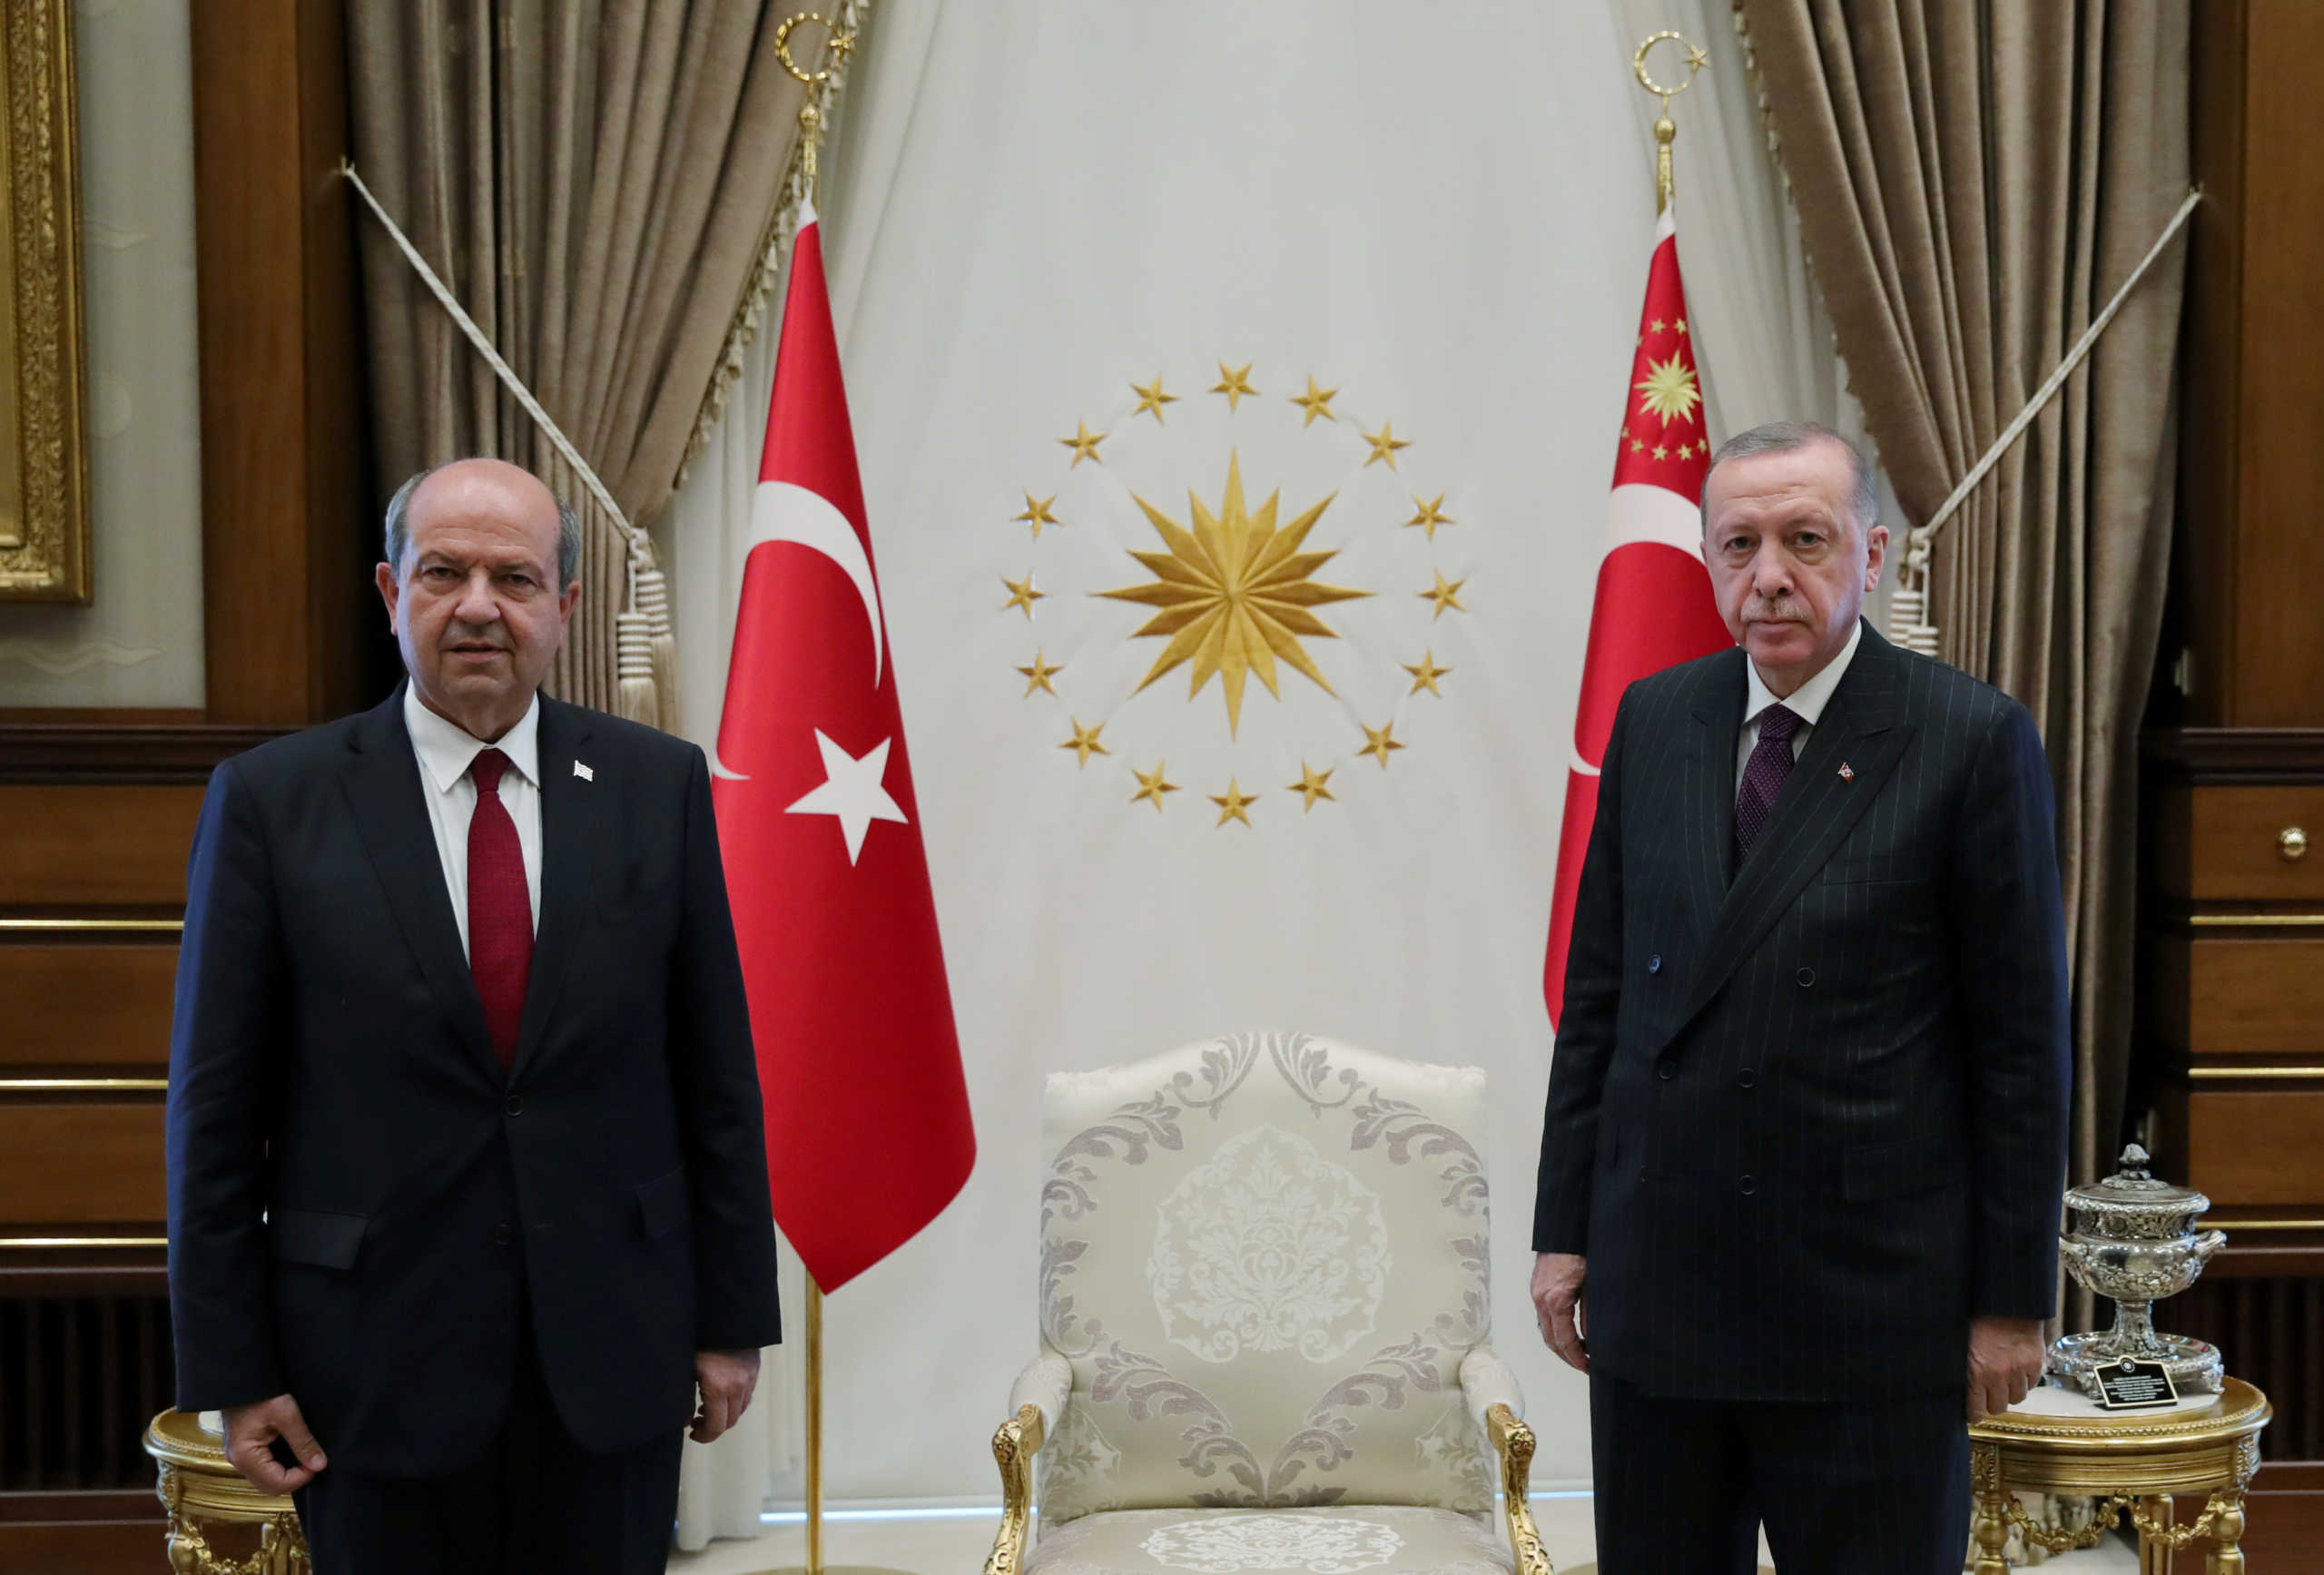 O εκλεκτός του Ερντογάν, Ερσίν Τατάρ, νέος πρόεδρος του τουρκοκυπριακού ψευδοκράτους